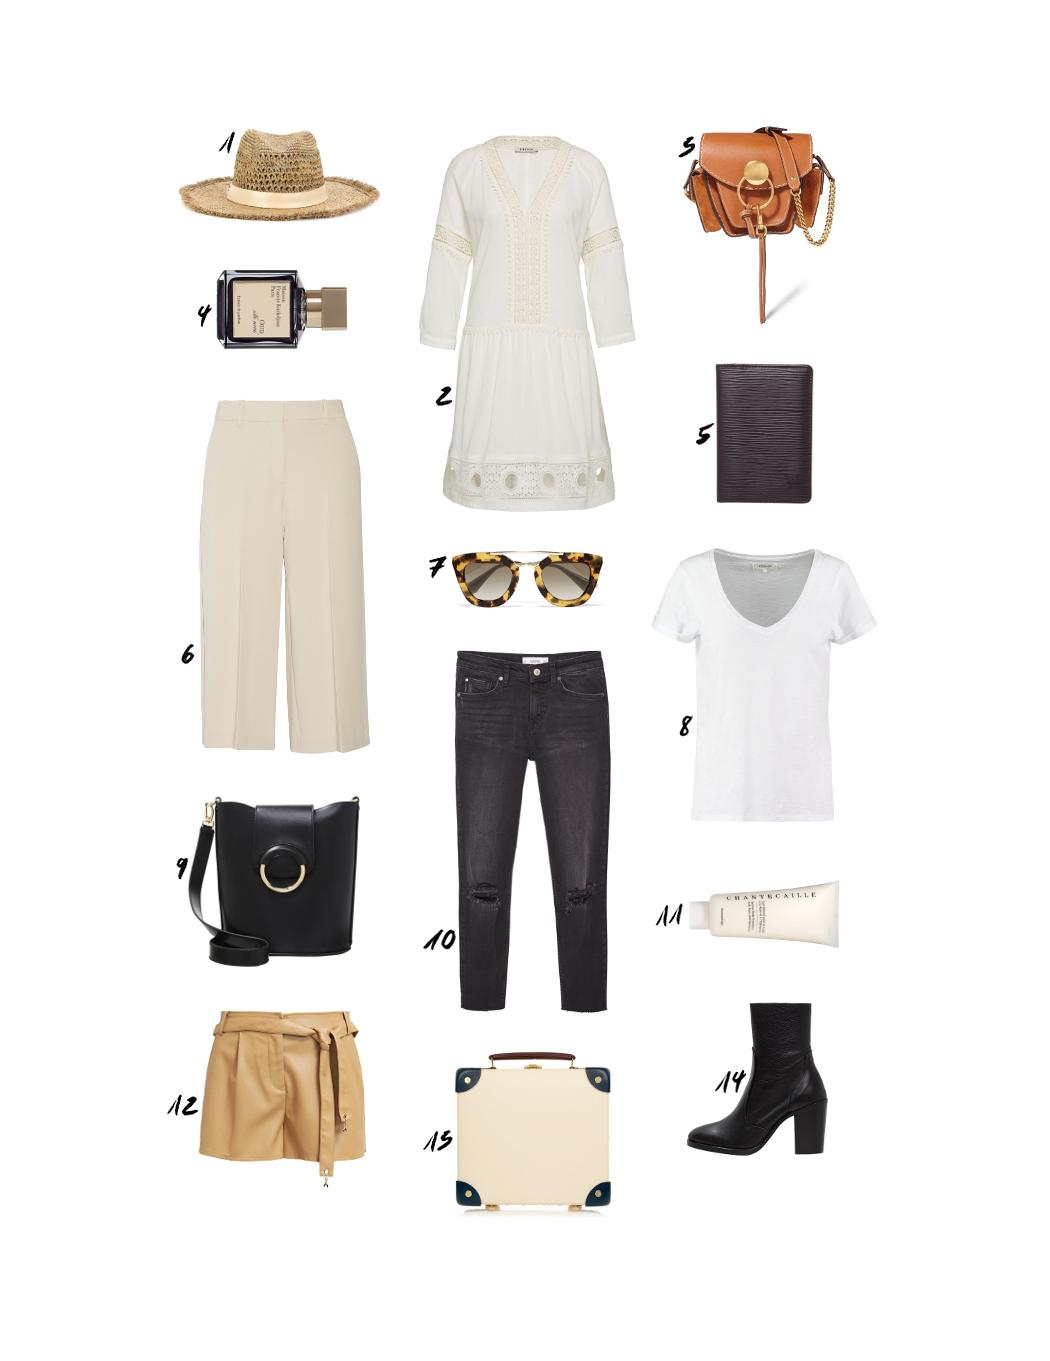 Texas Outfit Ideas